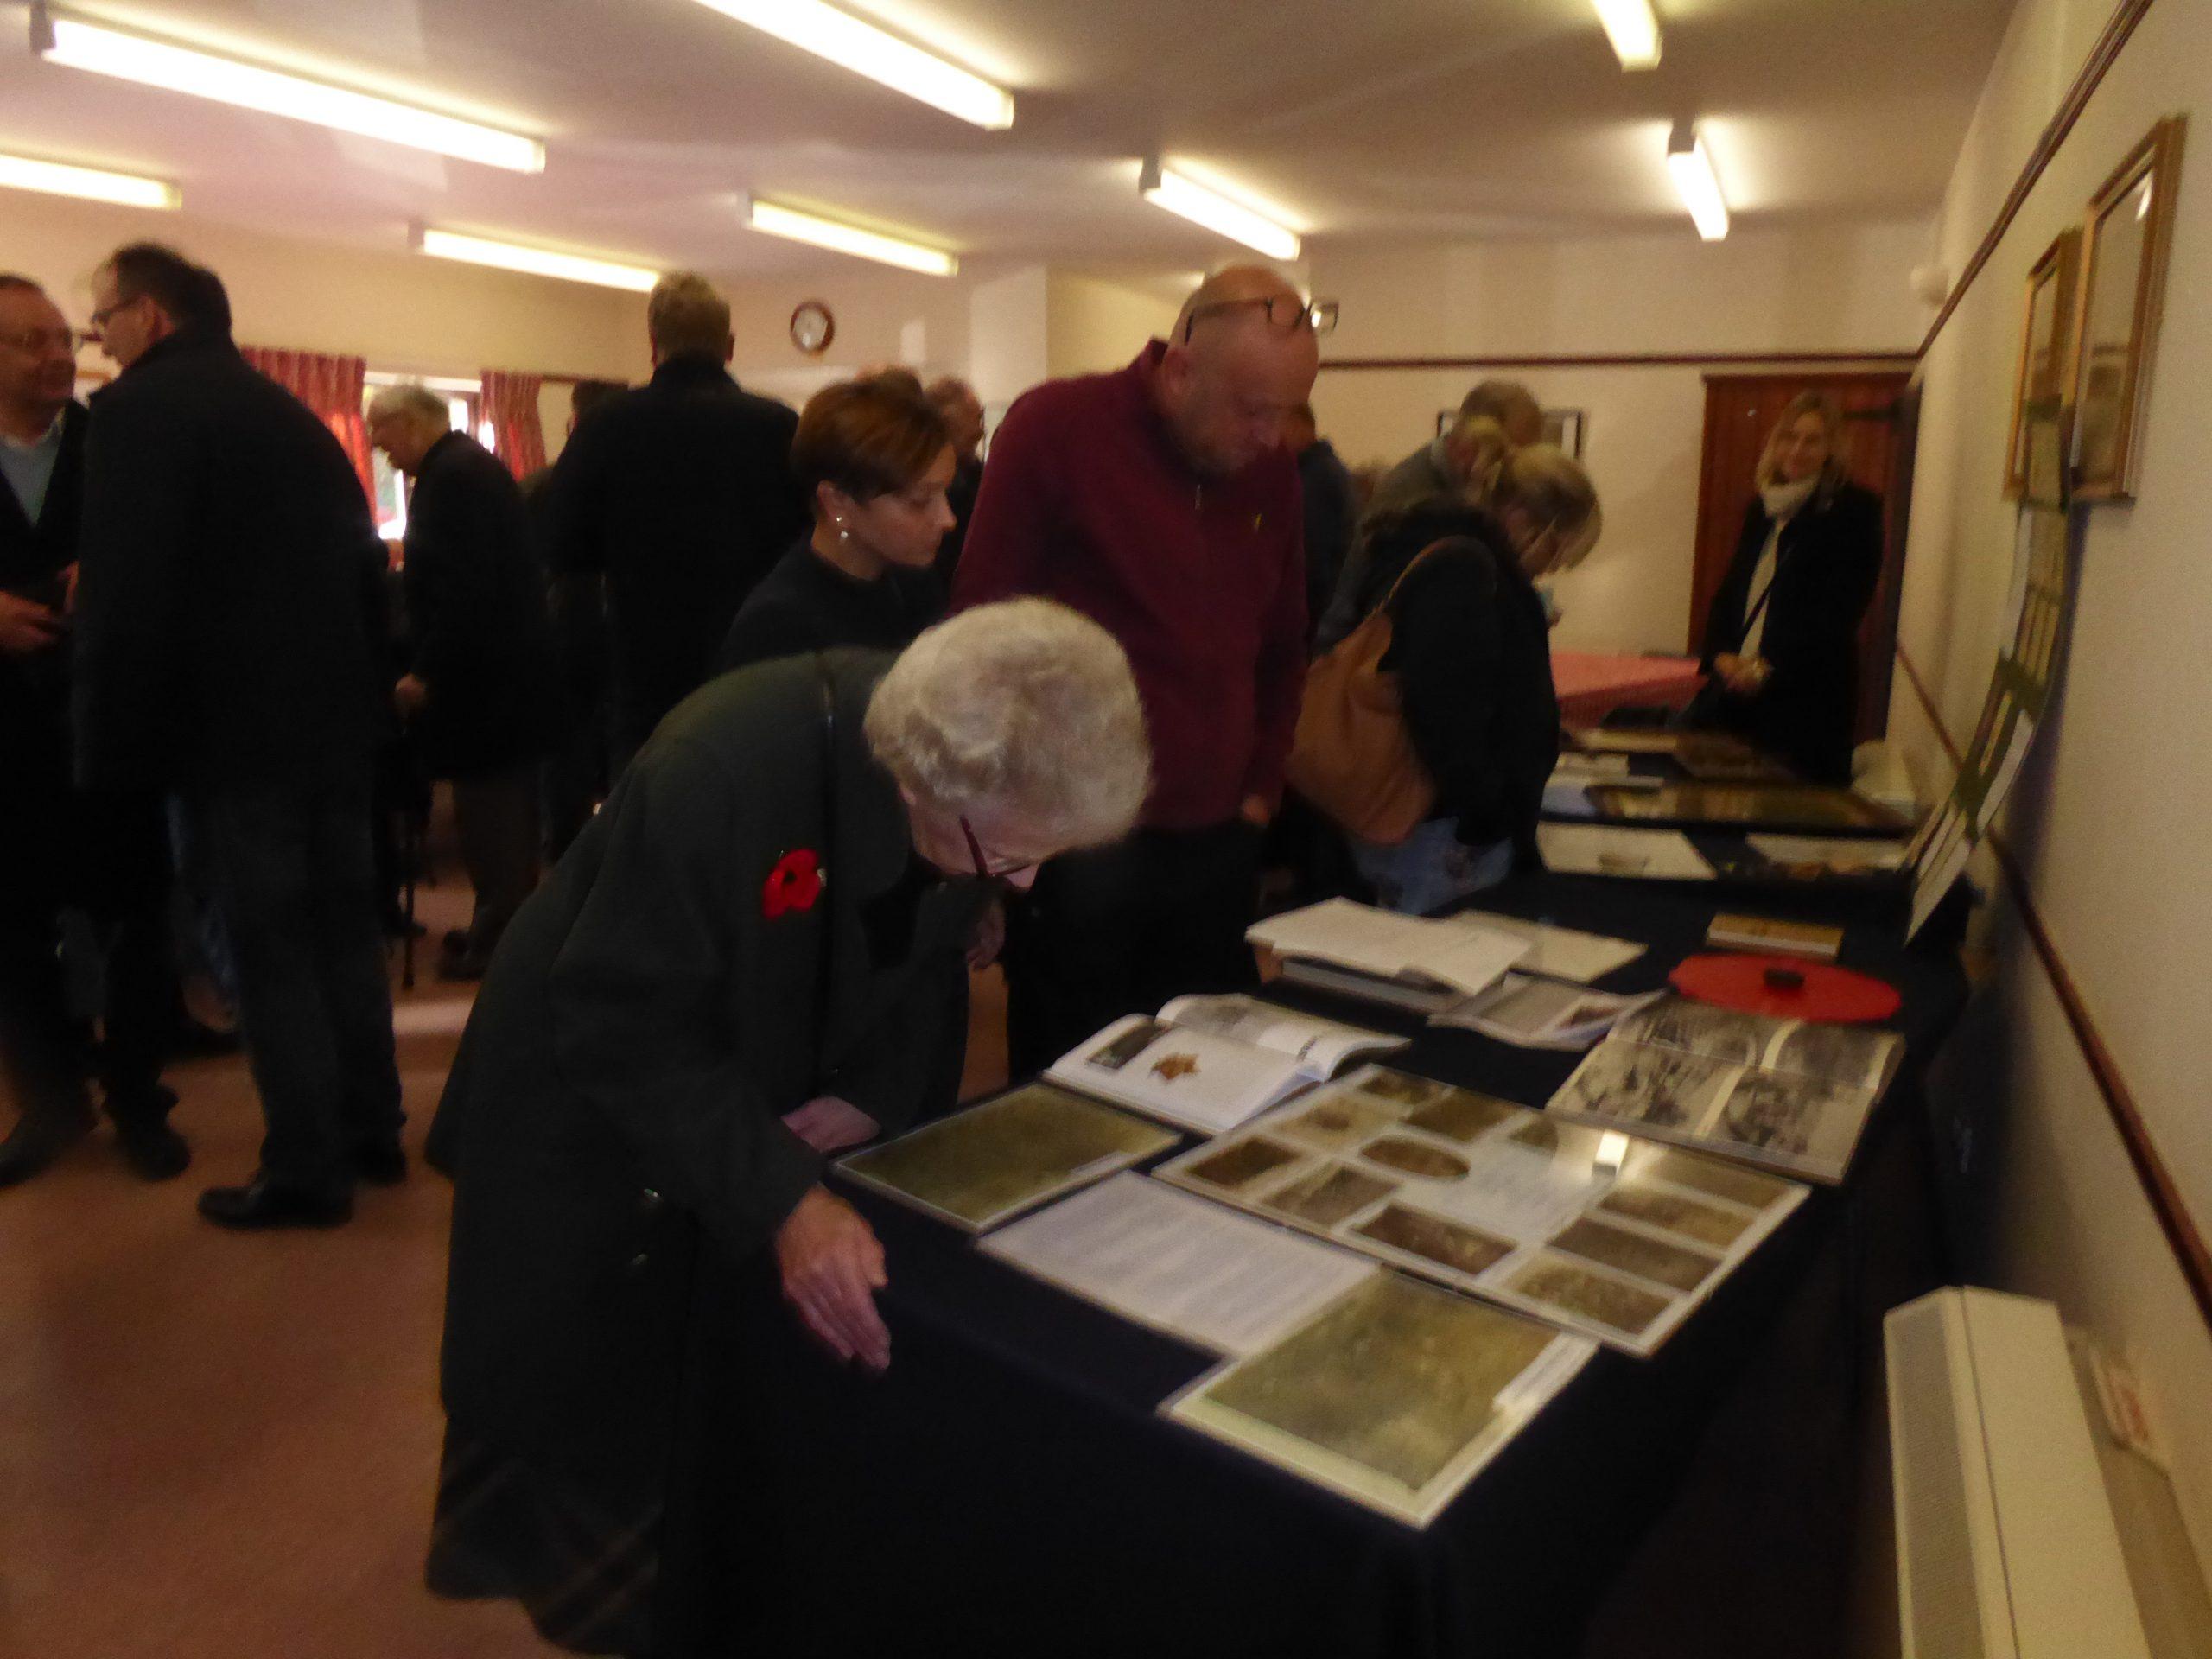 2018 / 1918 - Armistice Centenary Exhibition